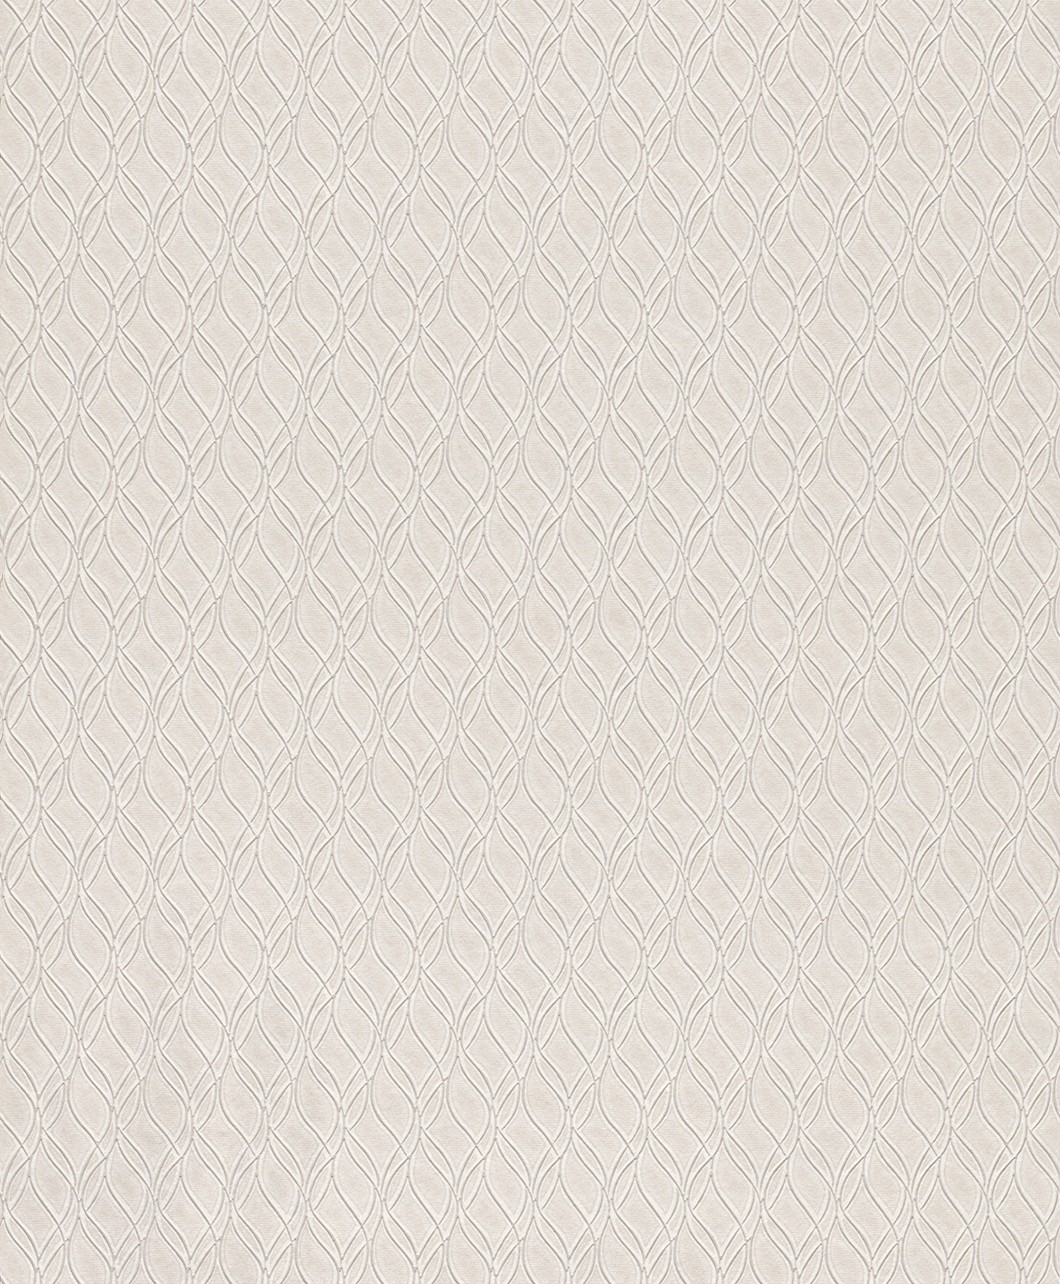 tapete rasch textil city view linien modern struktur beige grau 223810. Black Bedroom Furniture Sets. Home Design Ideas